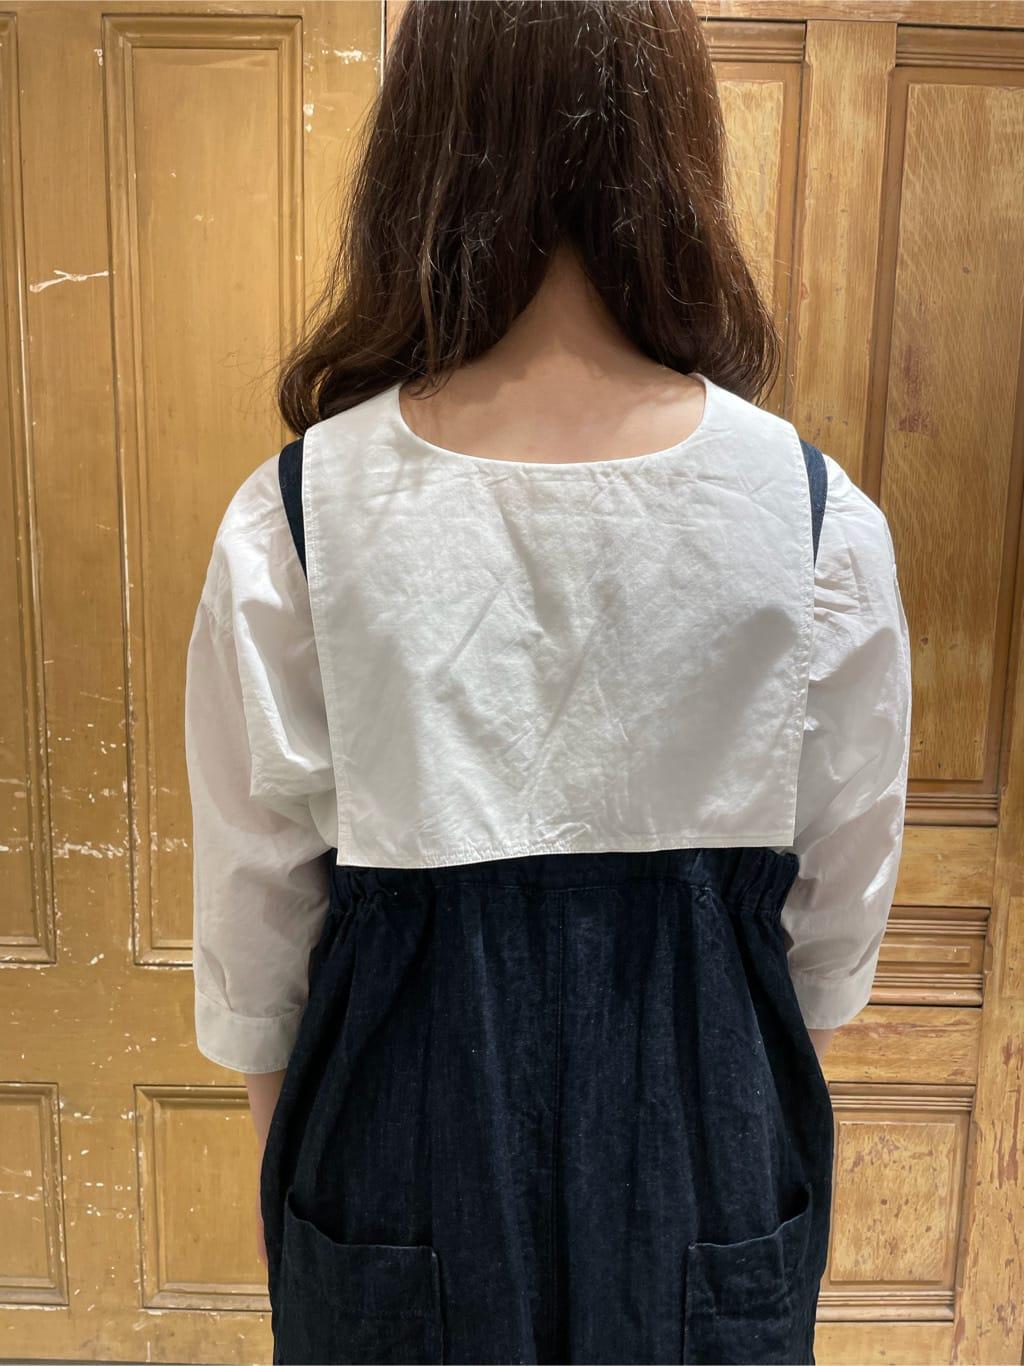 Malle chambre de charme ルミネ新宿 身長:163cm 2021.07.19